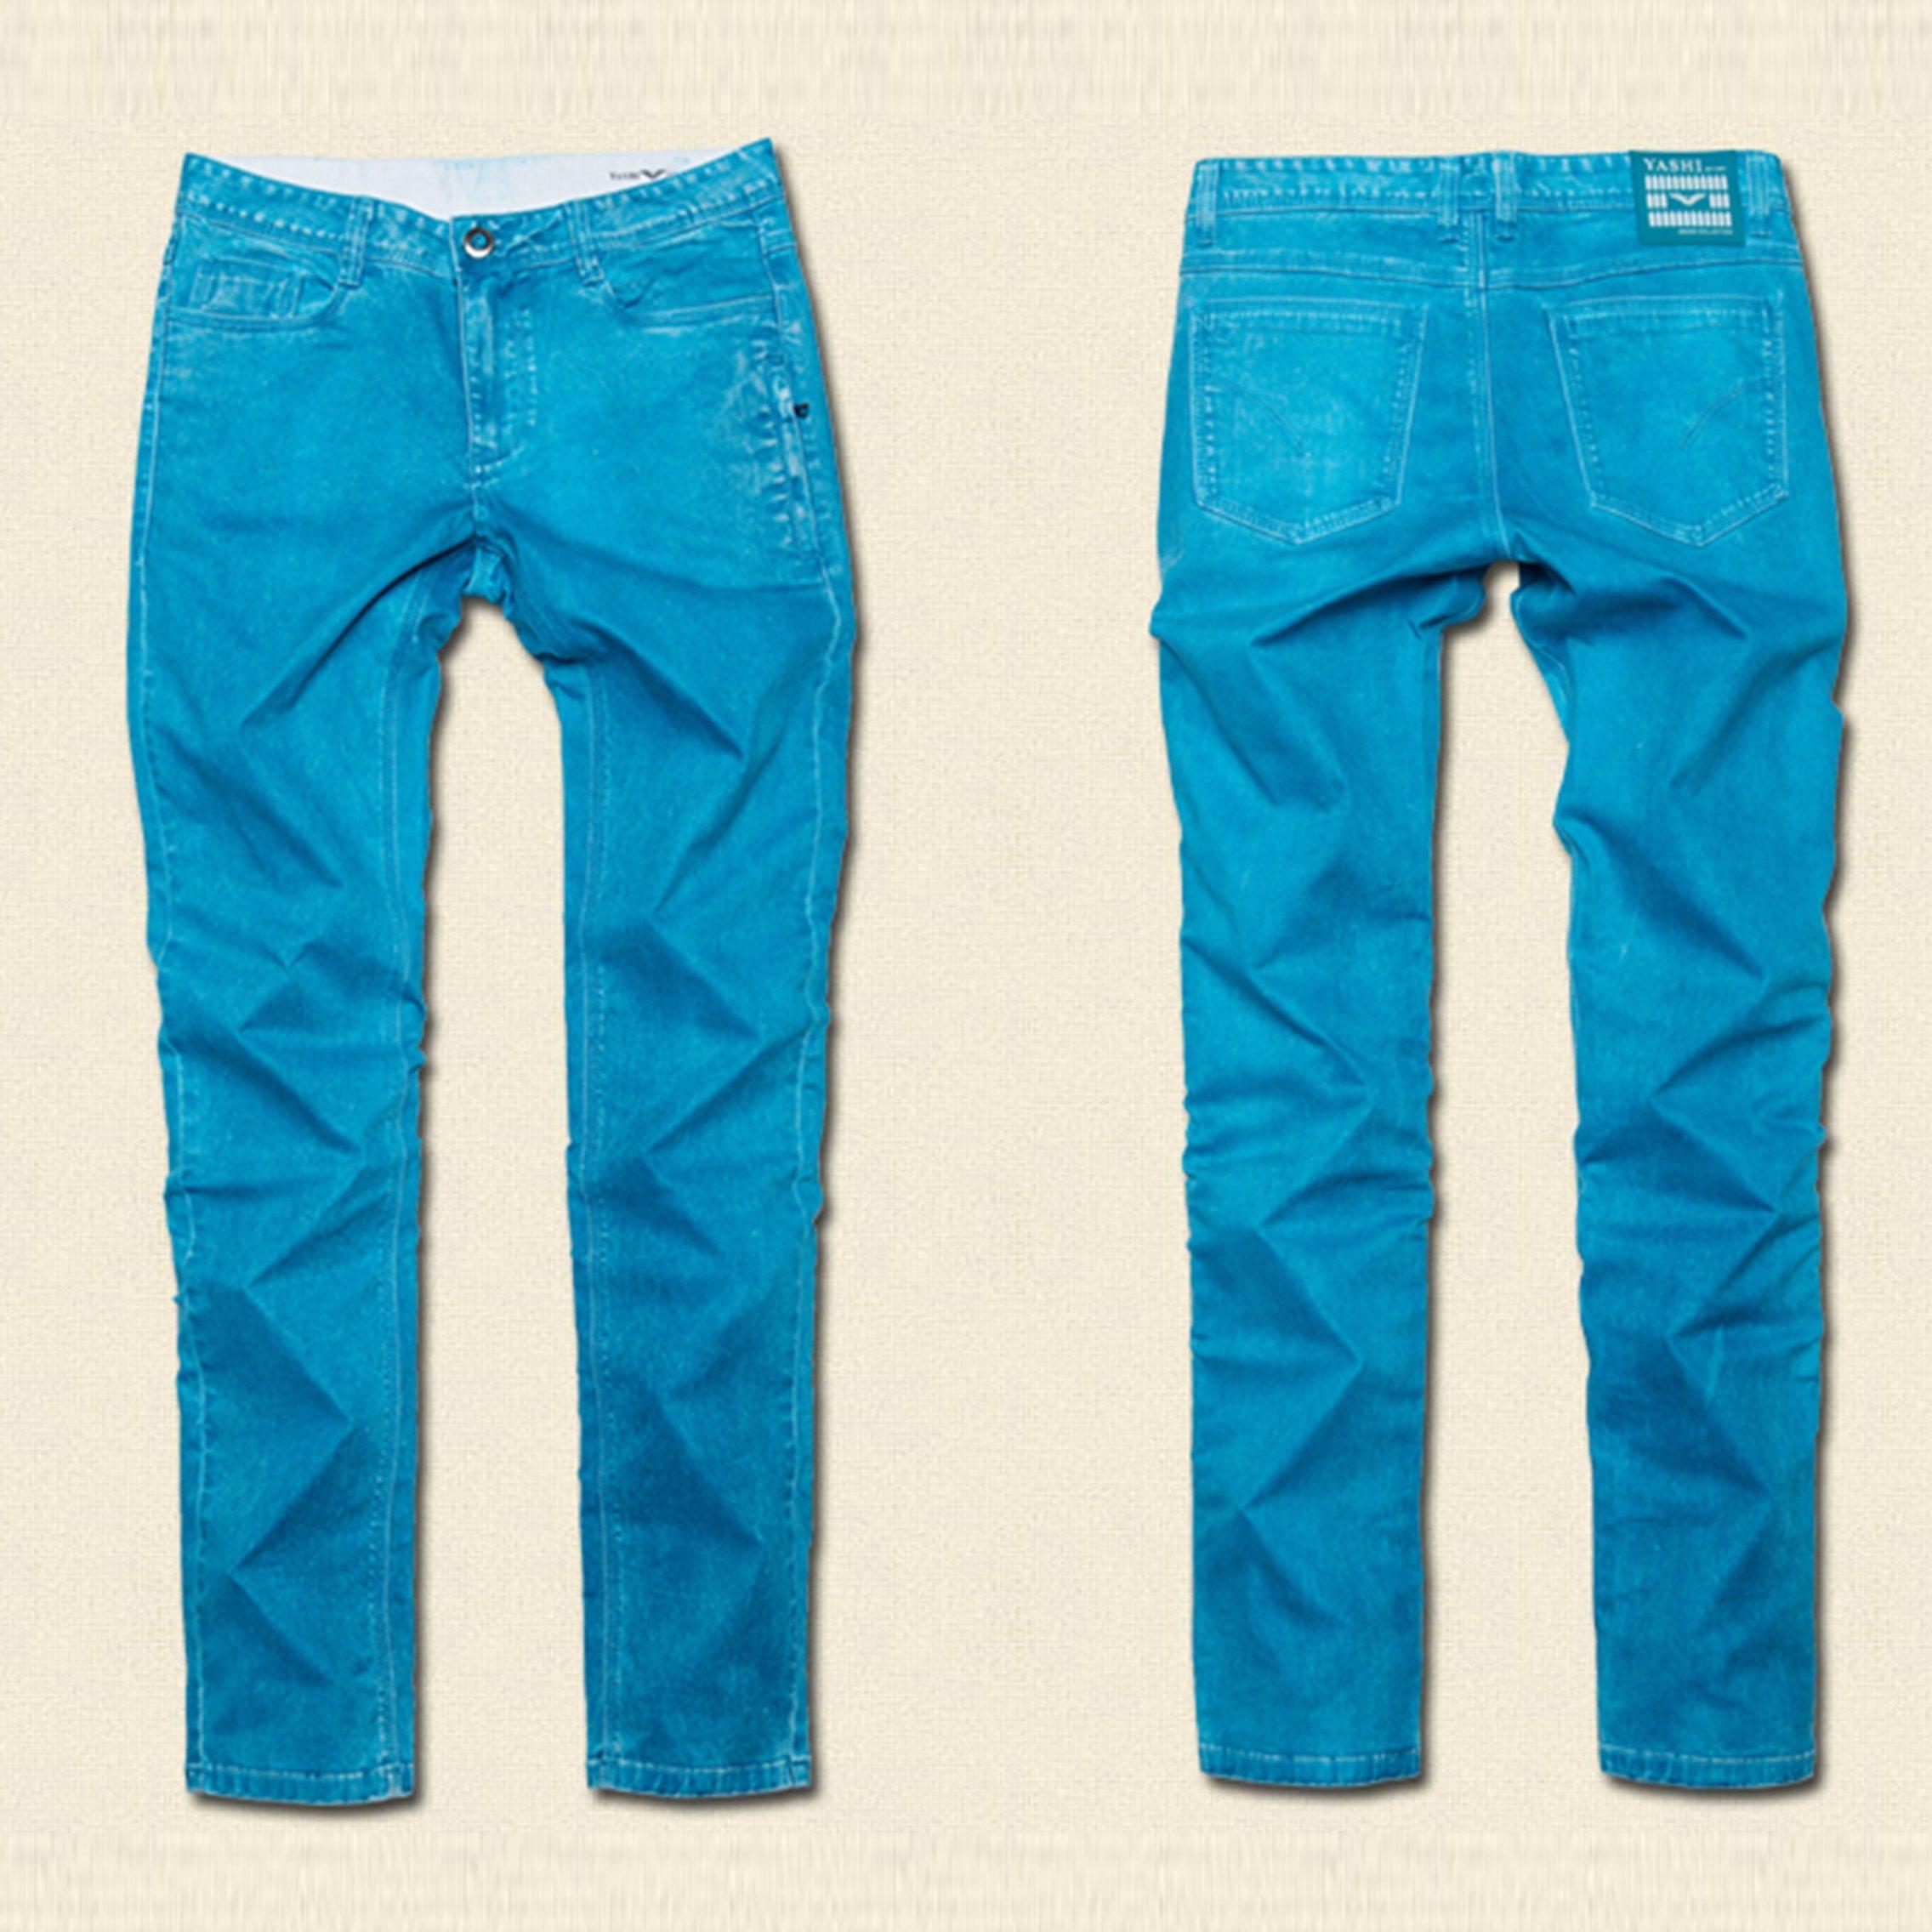 Men′s Fashion Casual Preppy Style Jeggings Pants